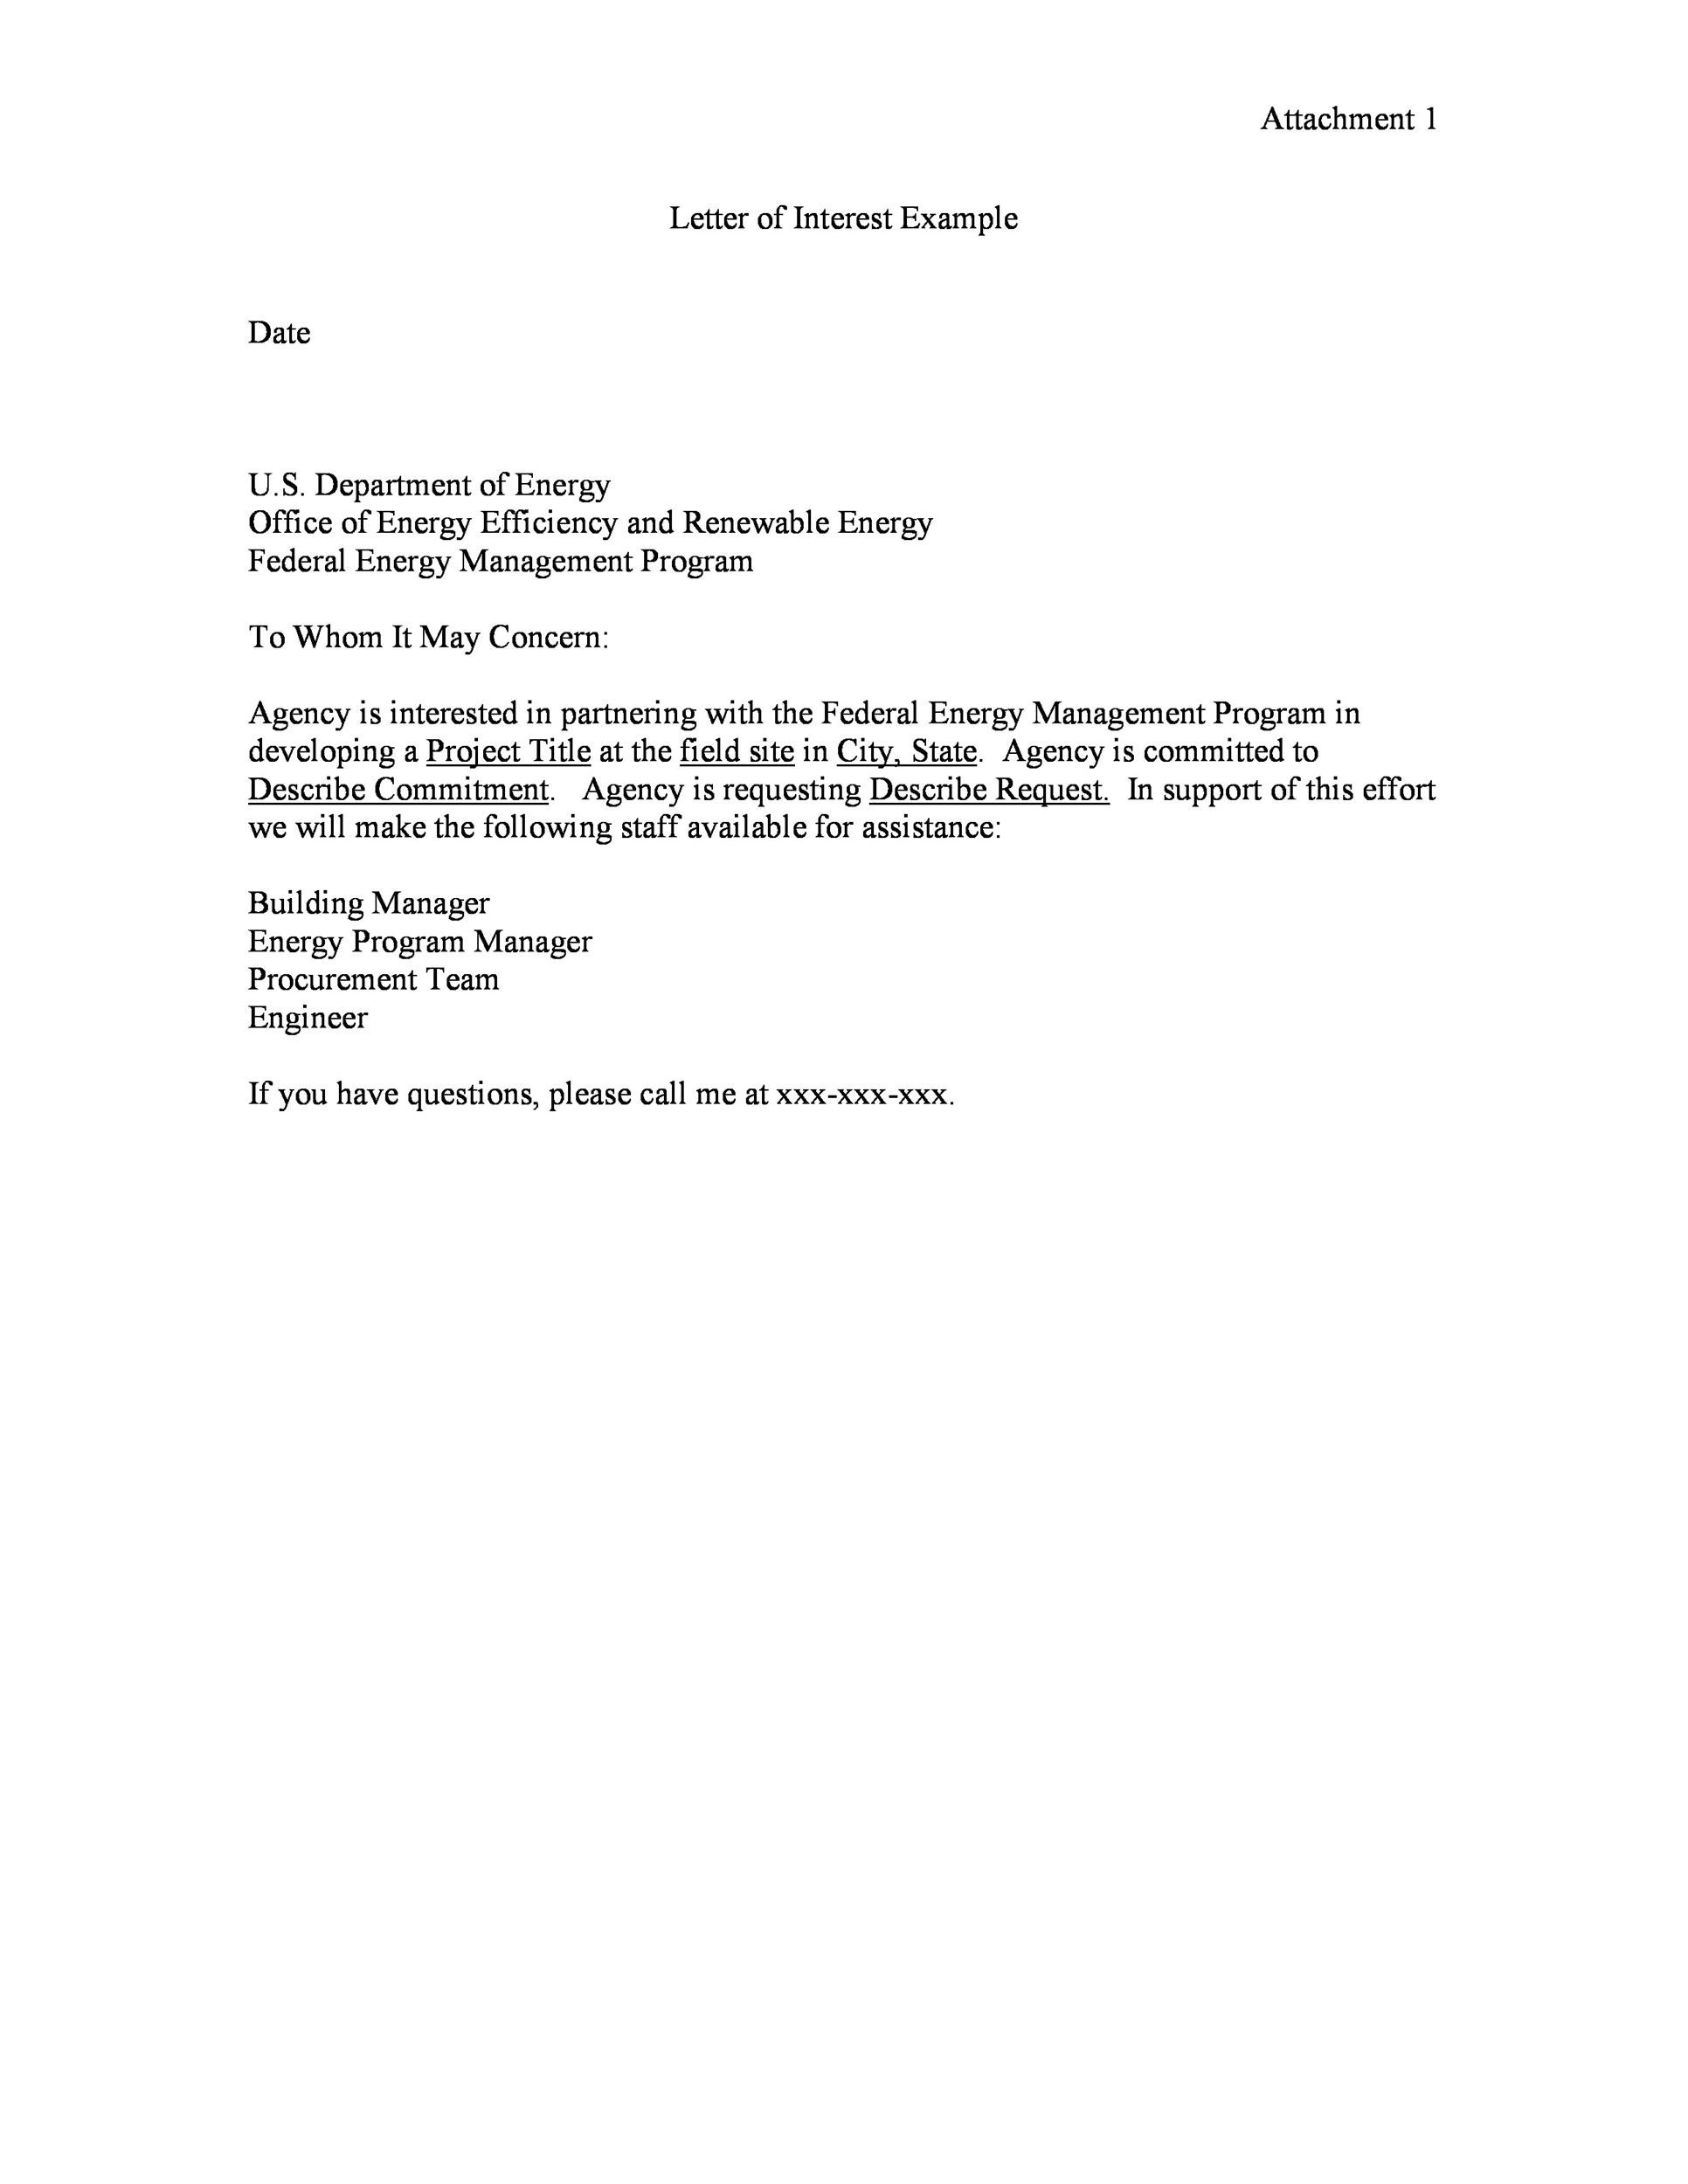 Free letter of interest 09